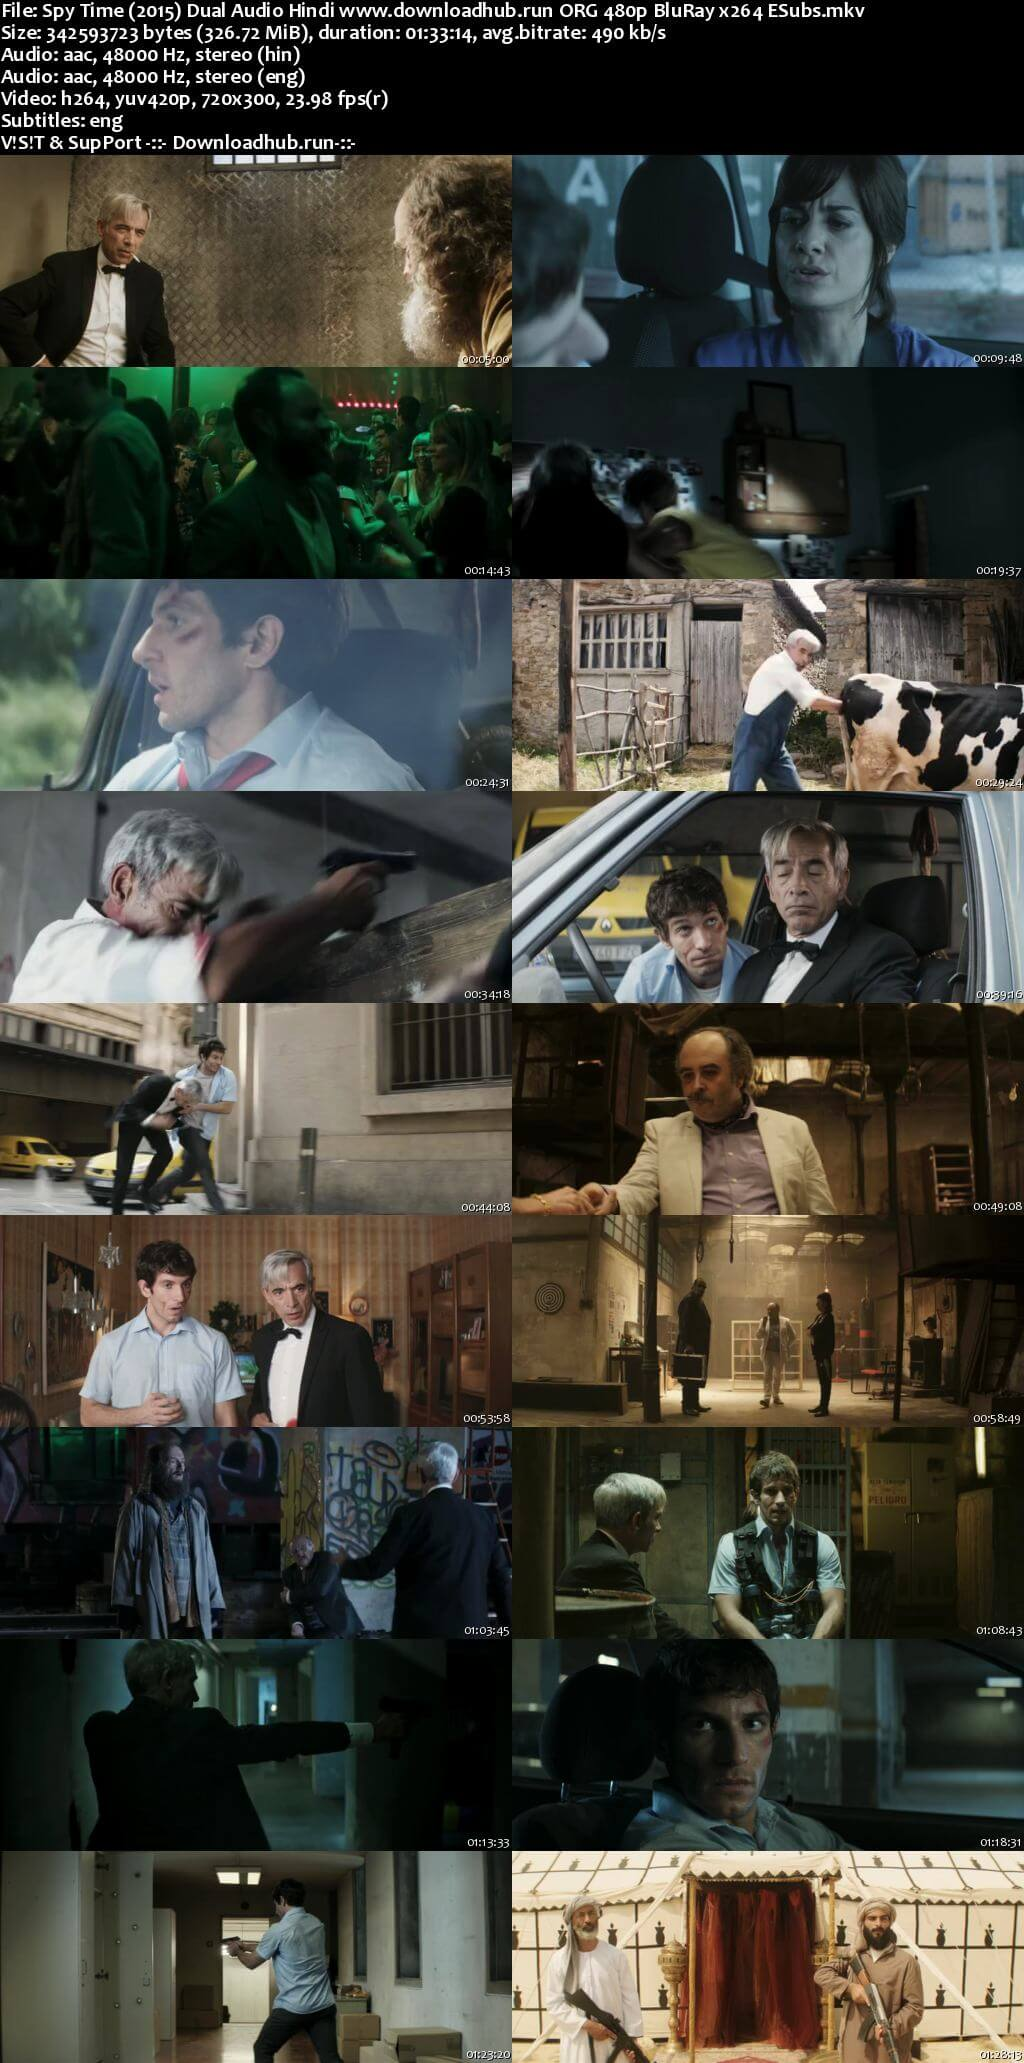 Spy Time 2015 Hindi Dual Audio 300MB BluRay 480p ESubs